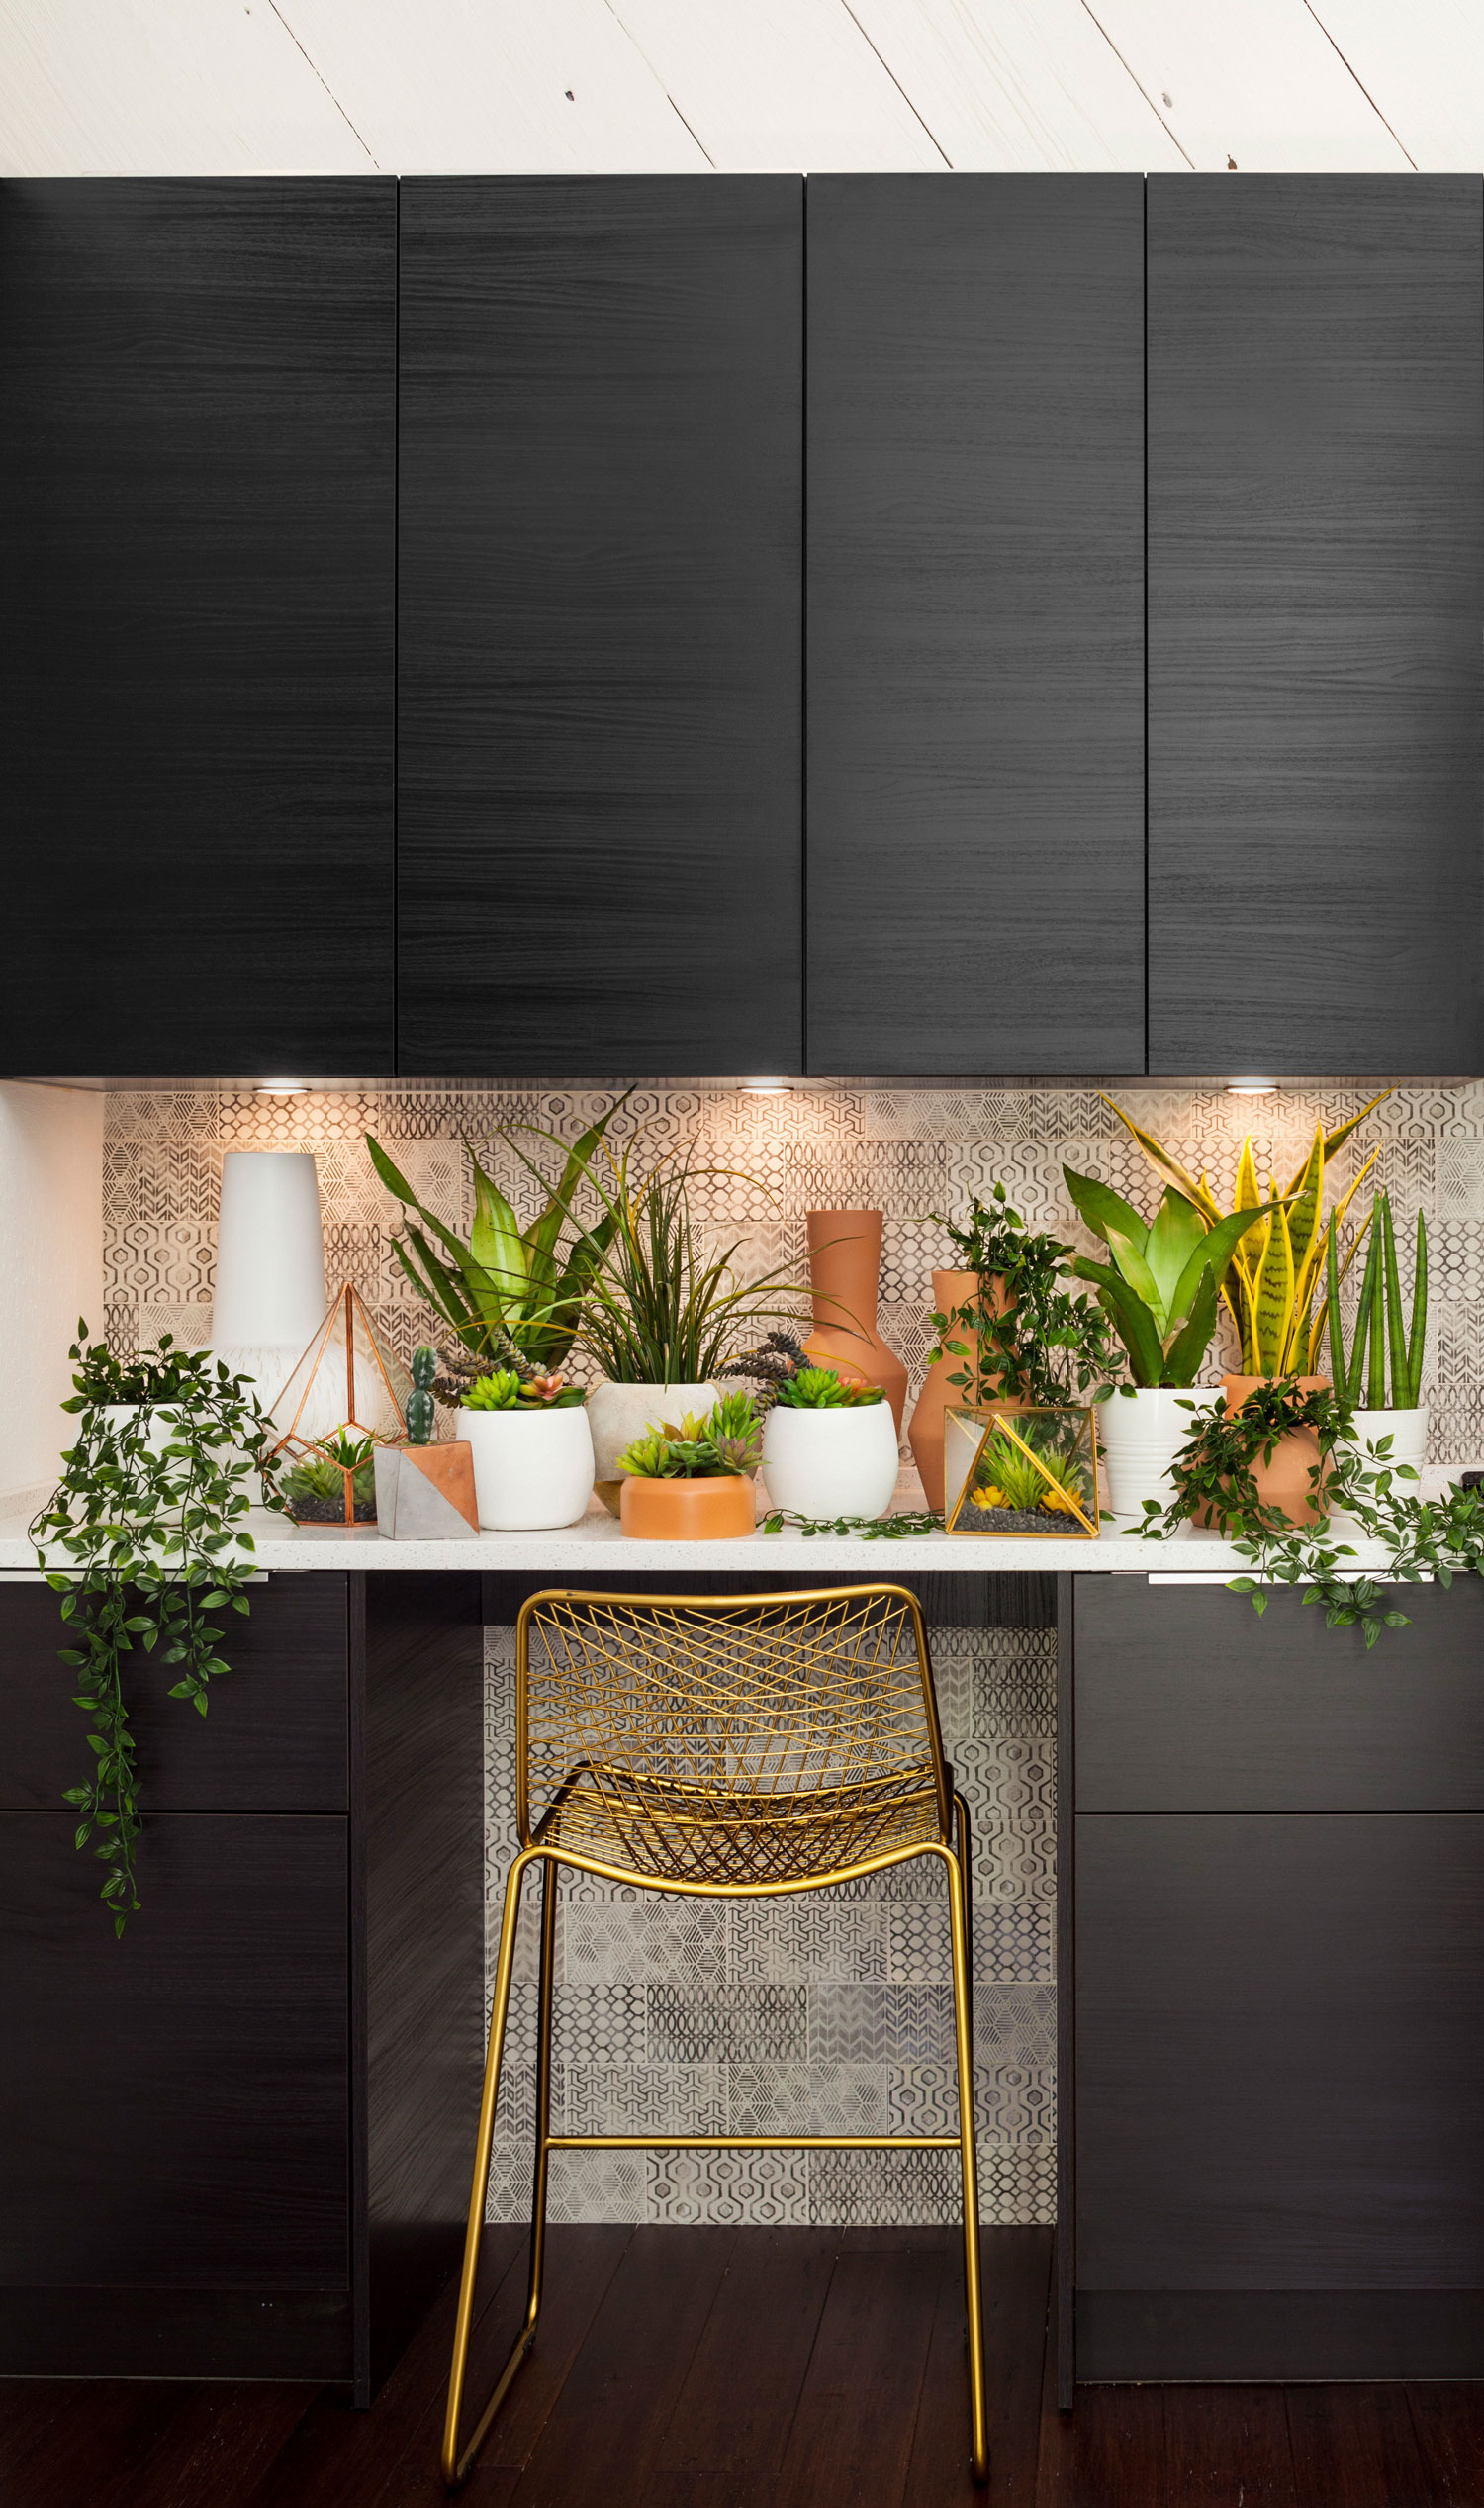 minneapolis-st-paul-home-decor-interior-designer-interior-stylist-interior-design-7.jpg